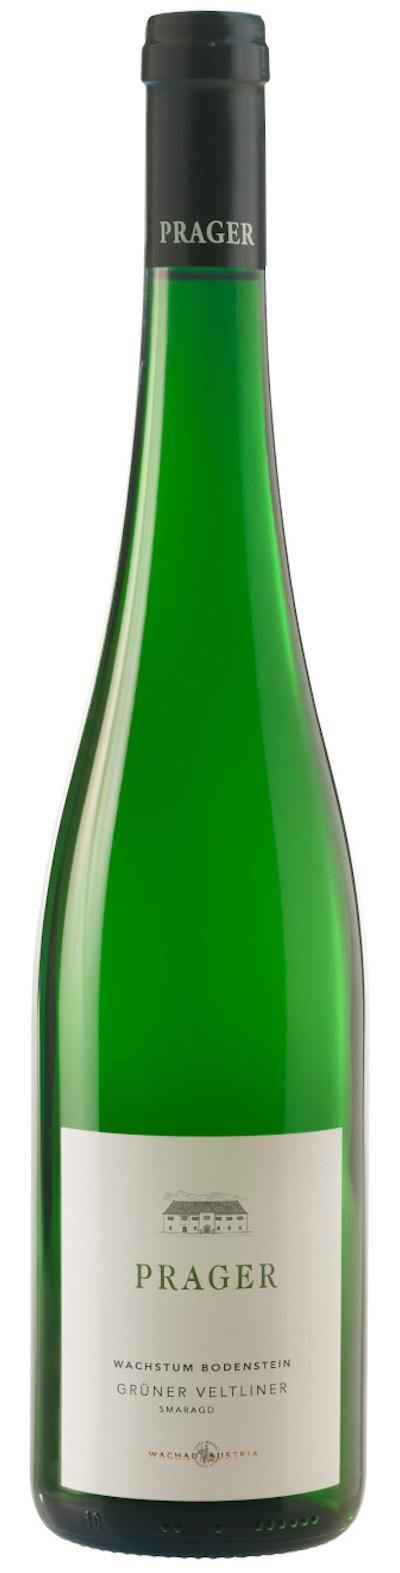 Prager - Grüner Veltliner Smaragd Wachstum Bodenstein